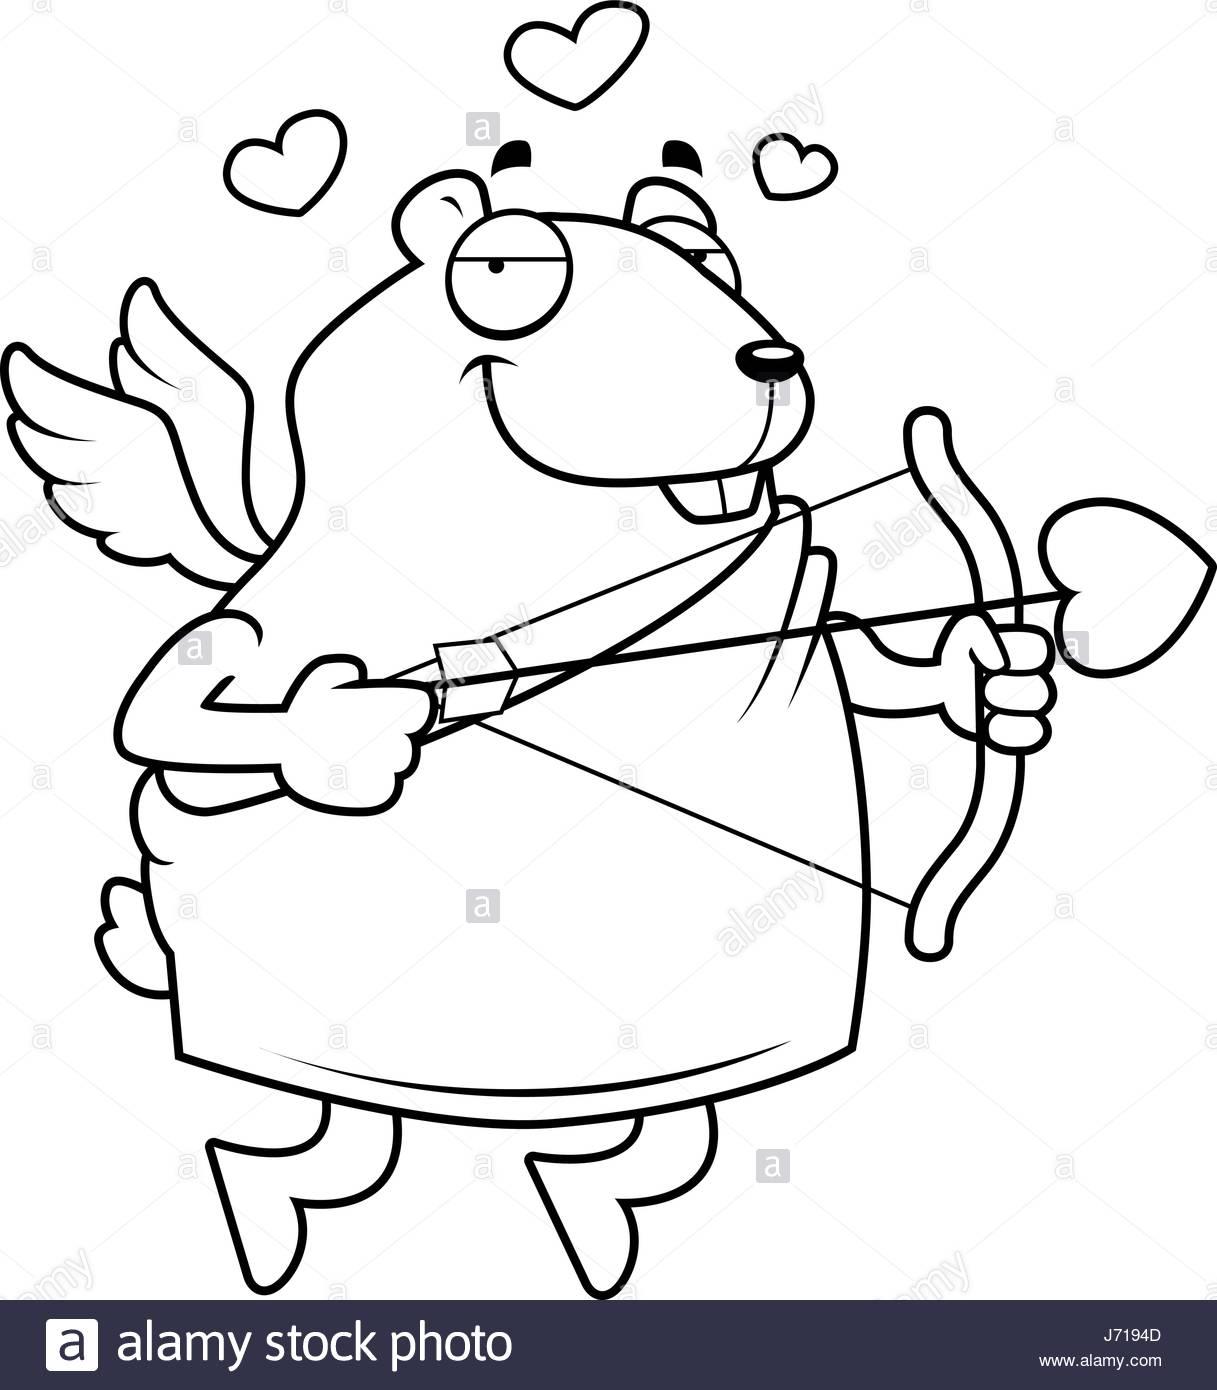 1217x1390 A Happy Cartoon Hamster Cupid With A Bow And Arrow Stock Vector